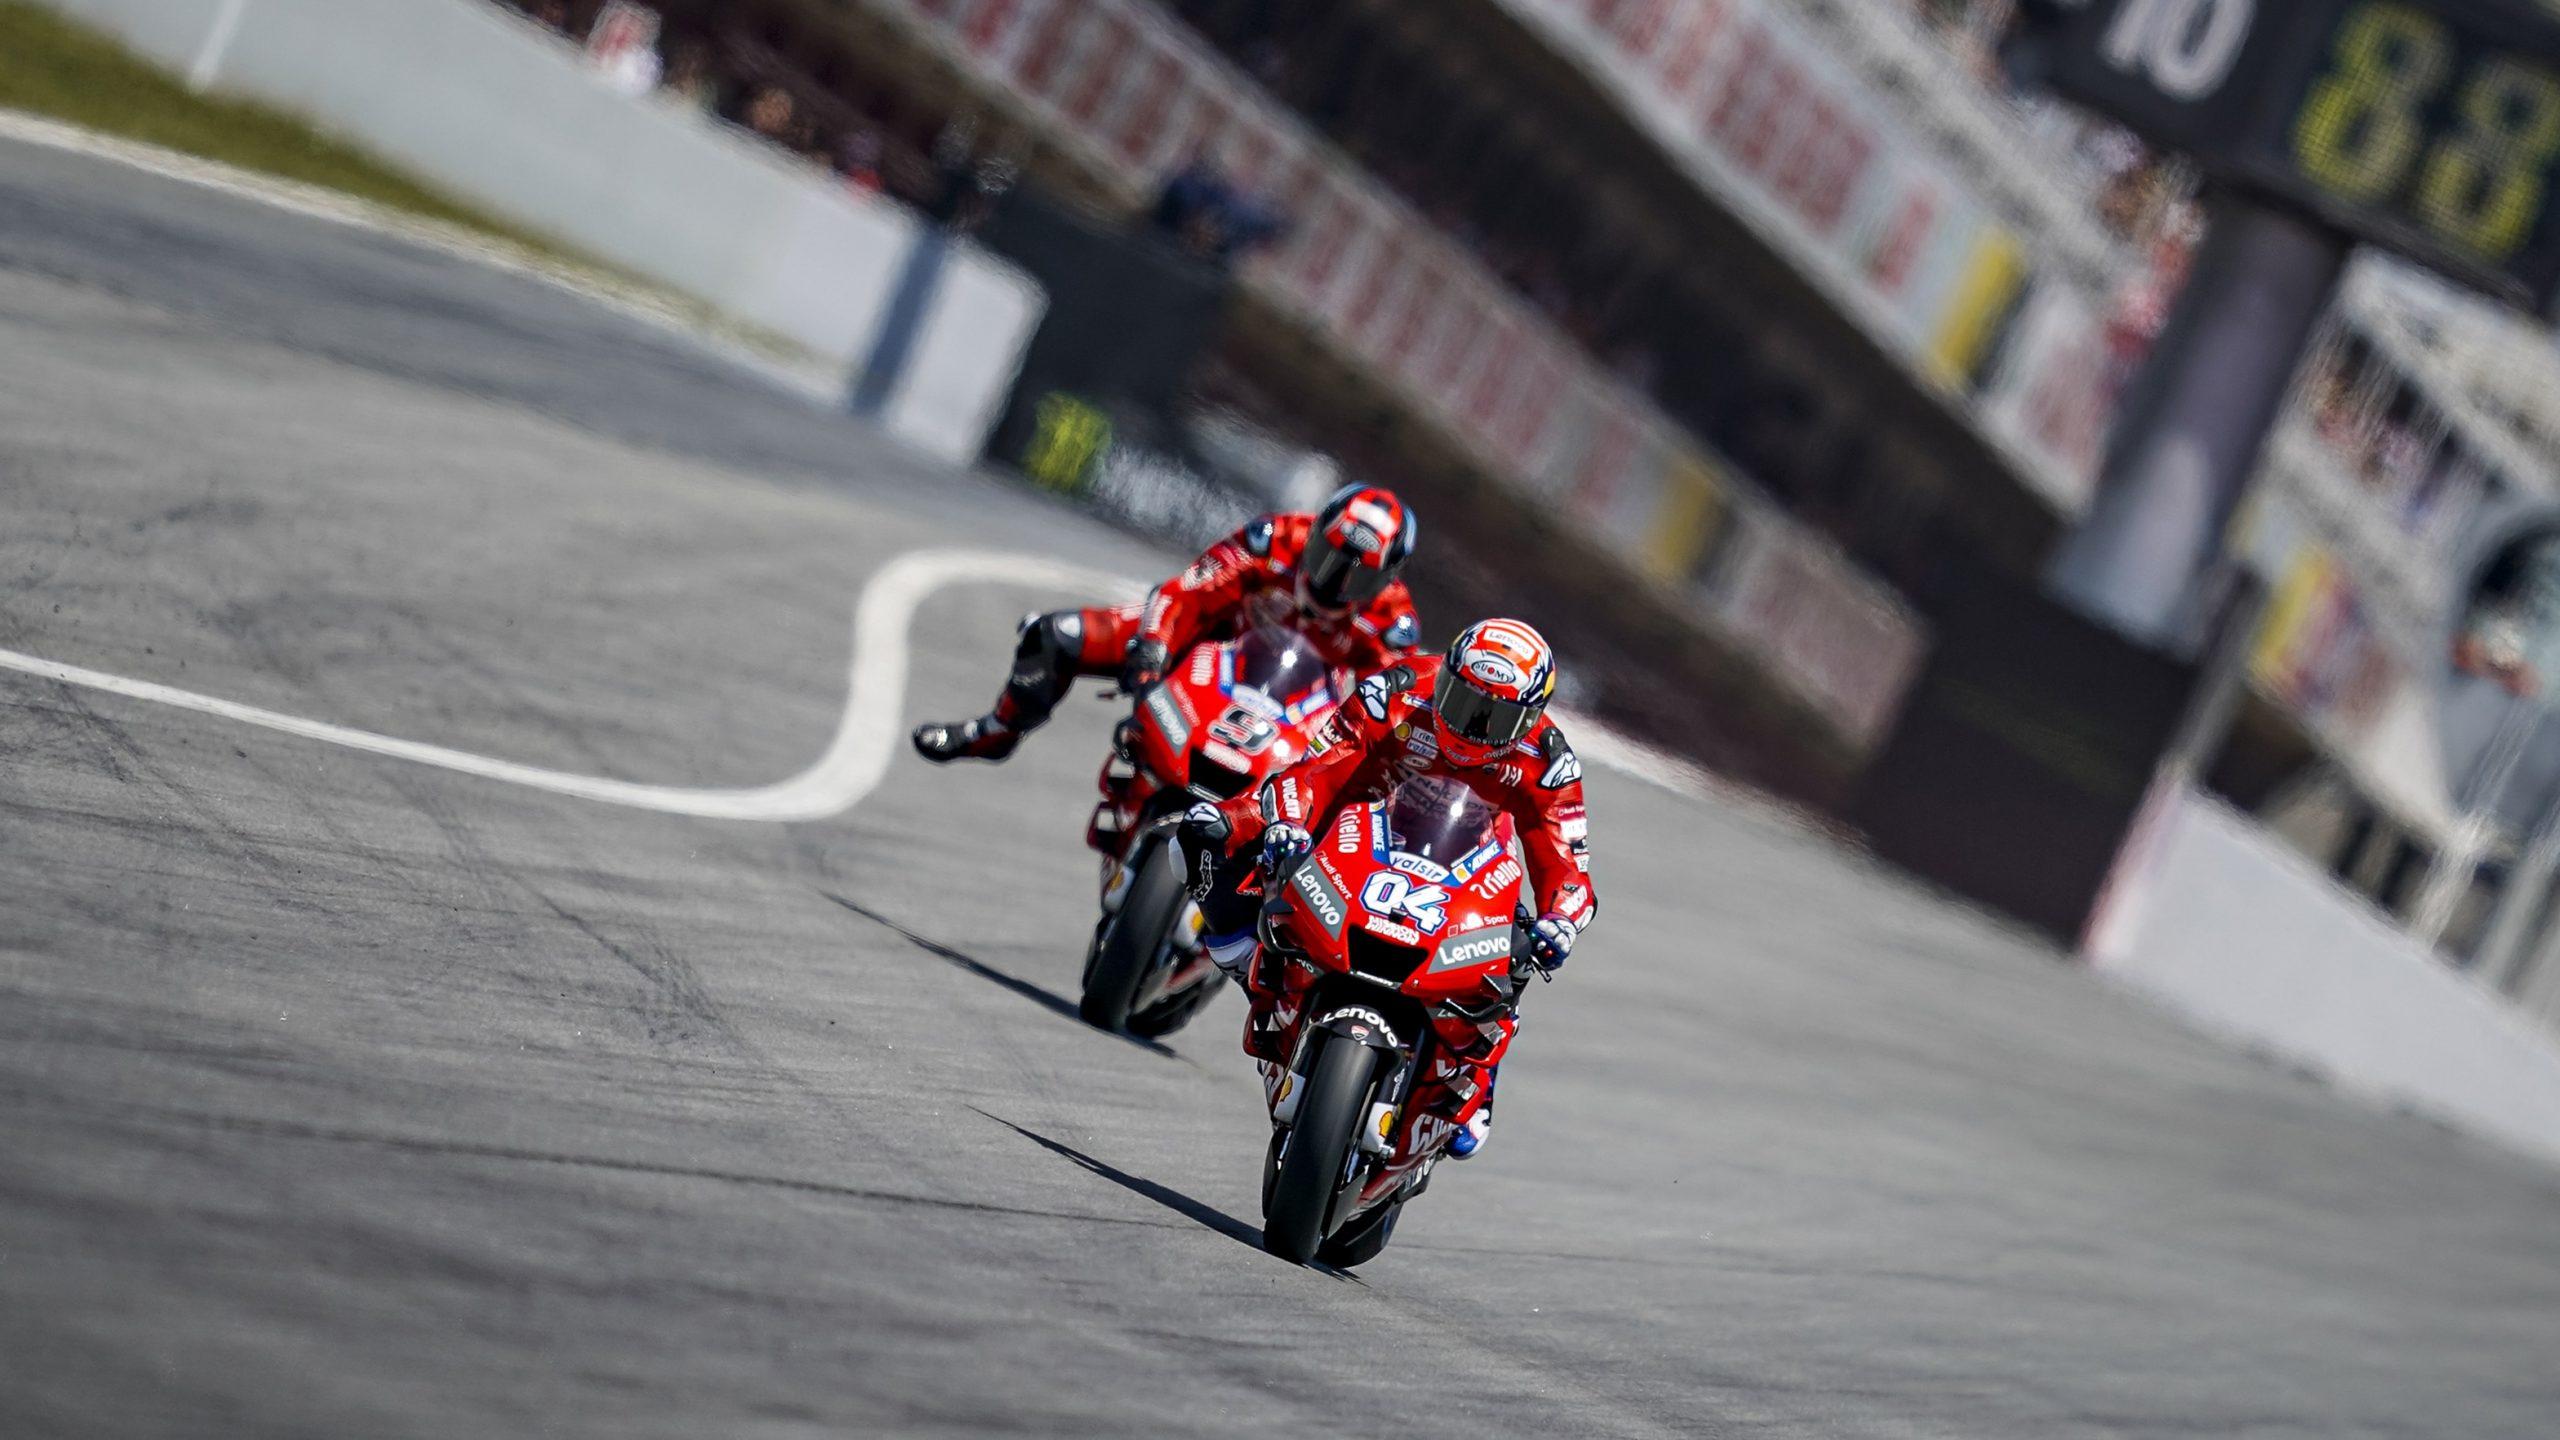 Ducati Team en MotoGP 2019: objetivos incumplidos pese a ser subcampeones